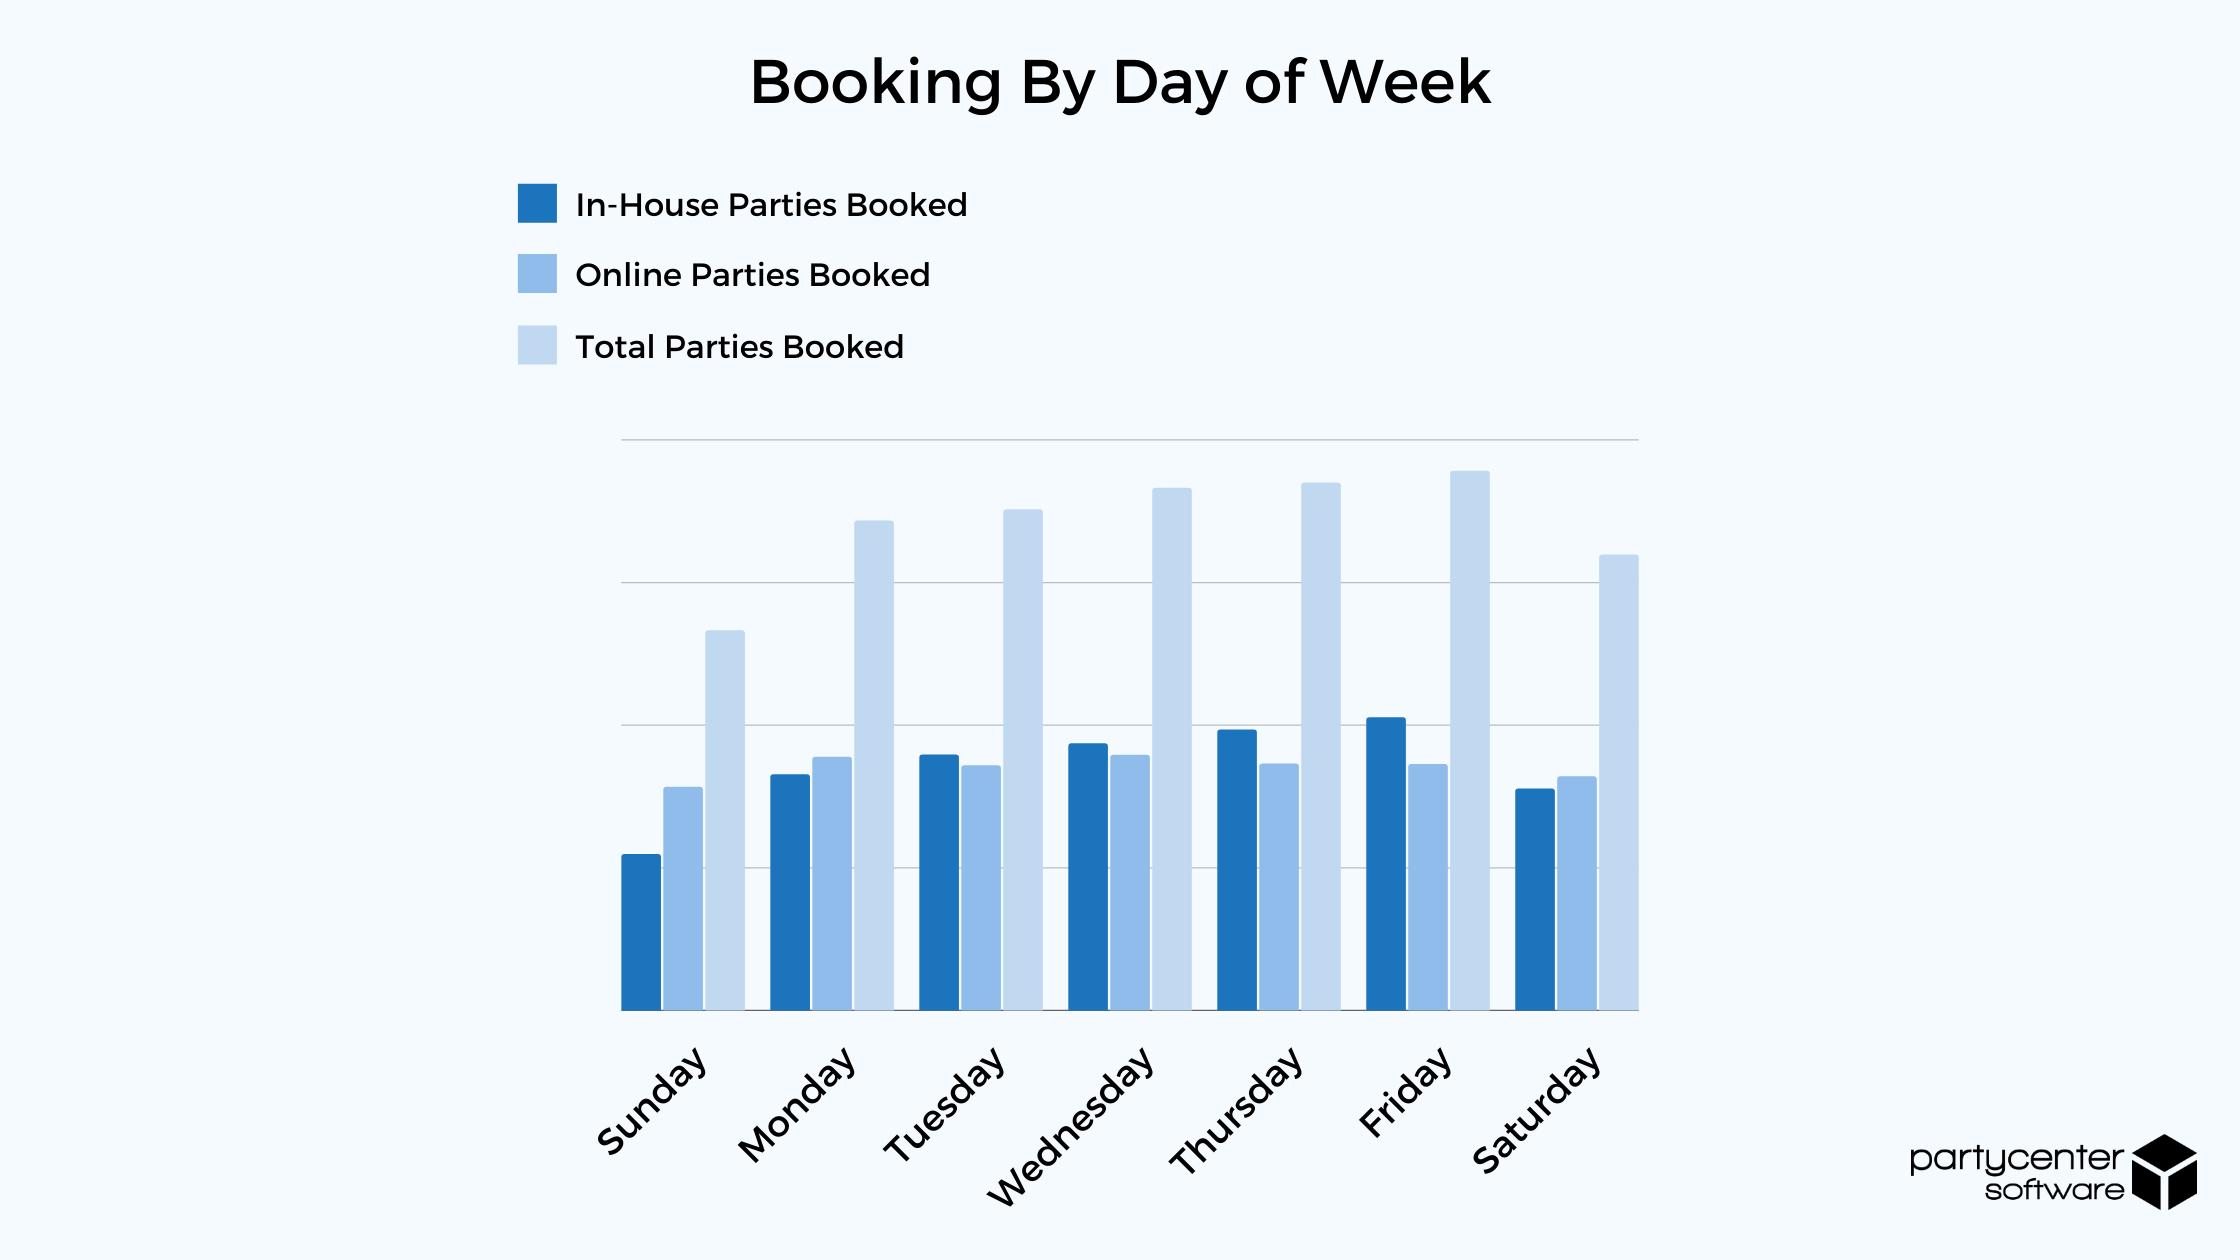 Bookings by Day of Week - 2020